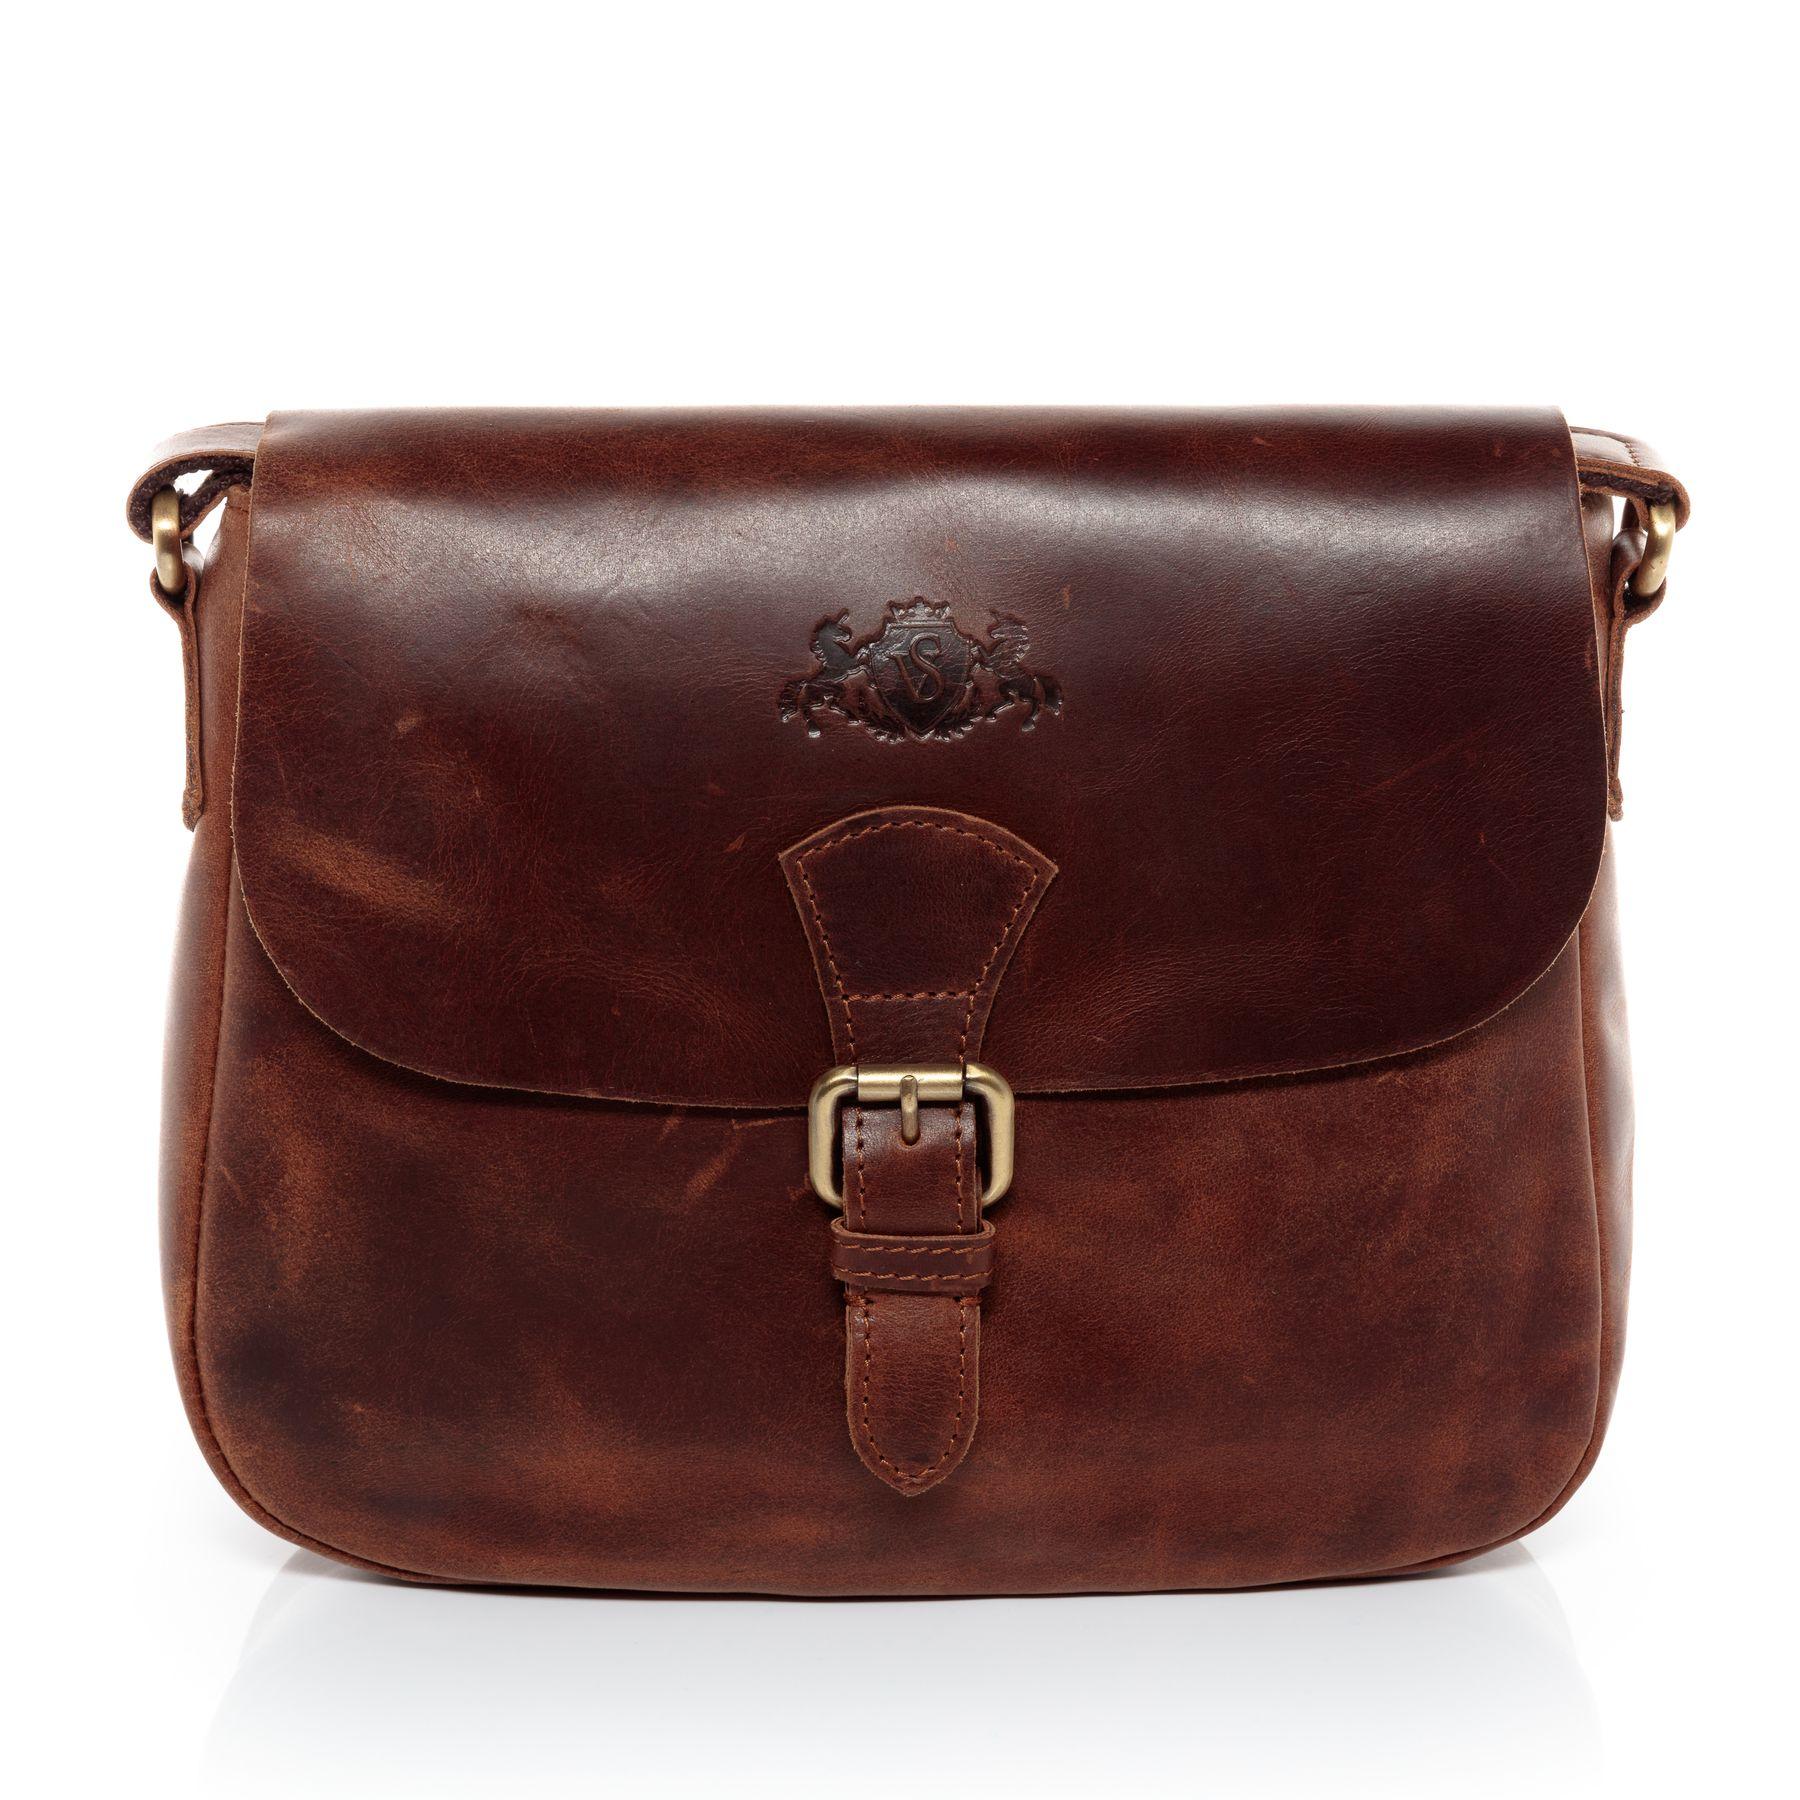 017c8e19cb46a SID   VAIN Schultertasche Natur-Leder YALE braun-cognac Handtasche  Schultergurt Schultertasche Taschen Damentaschen